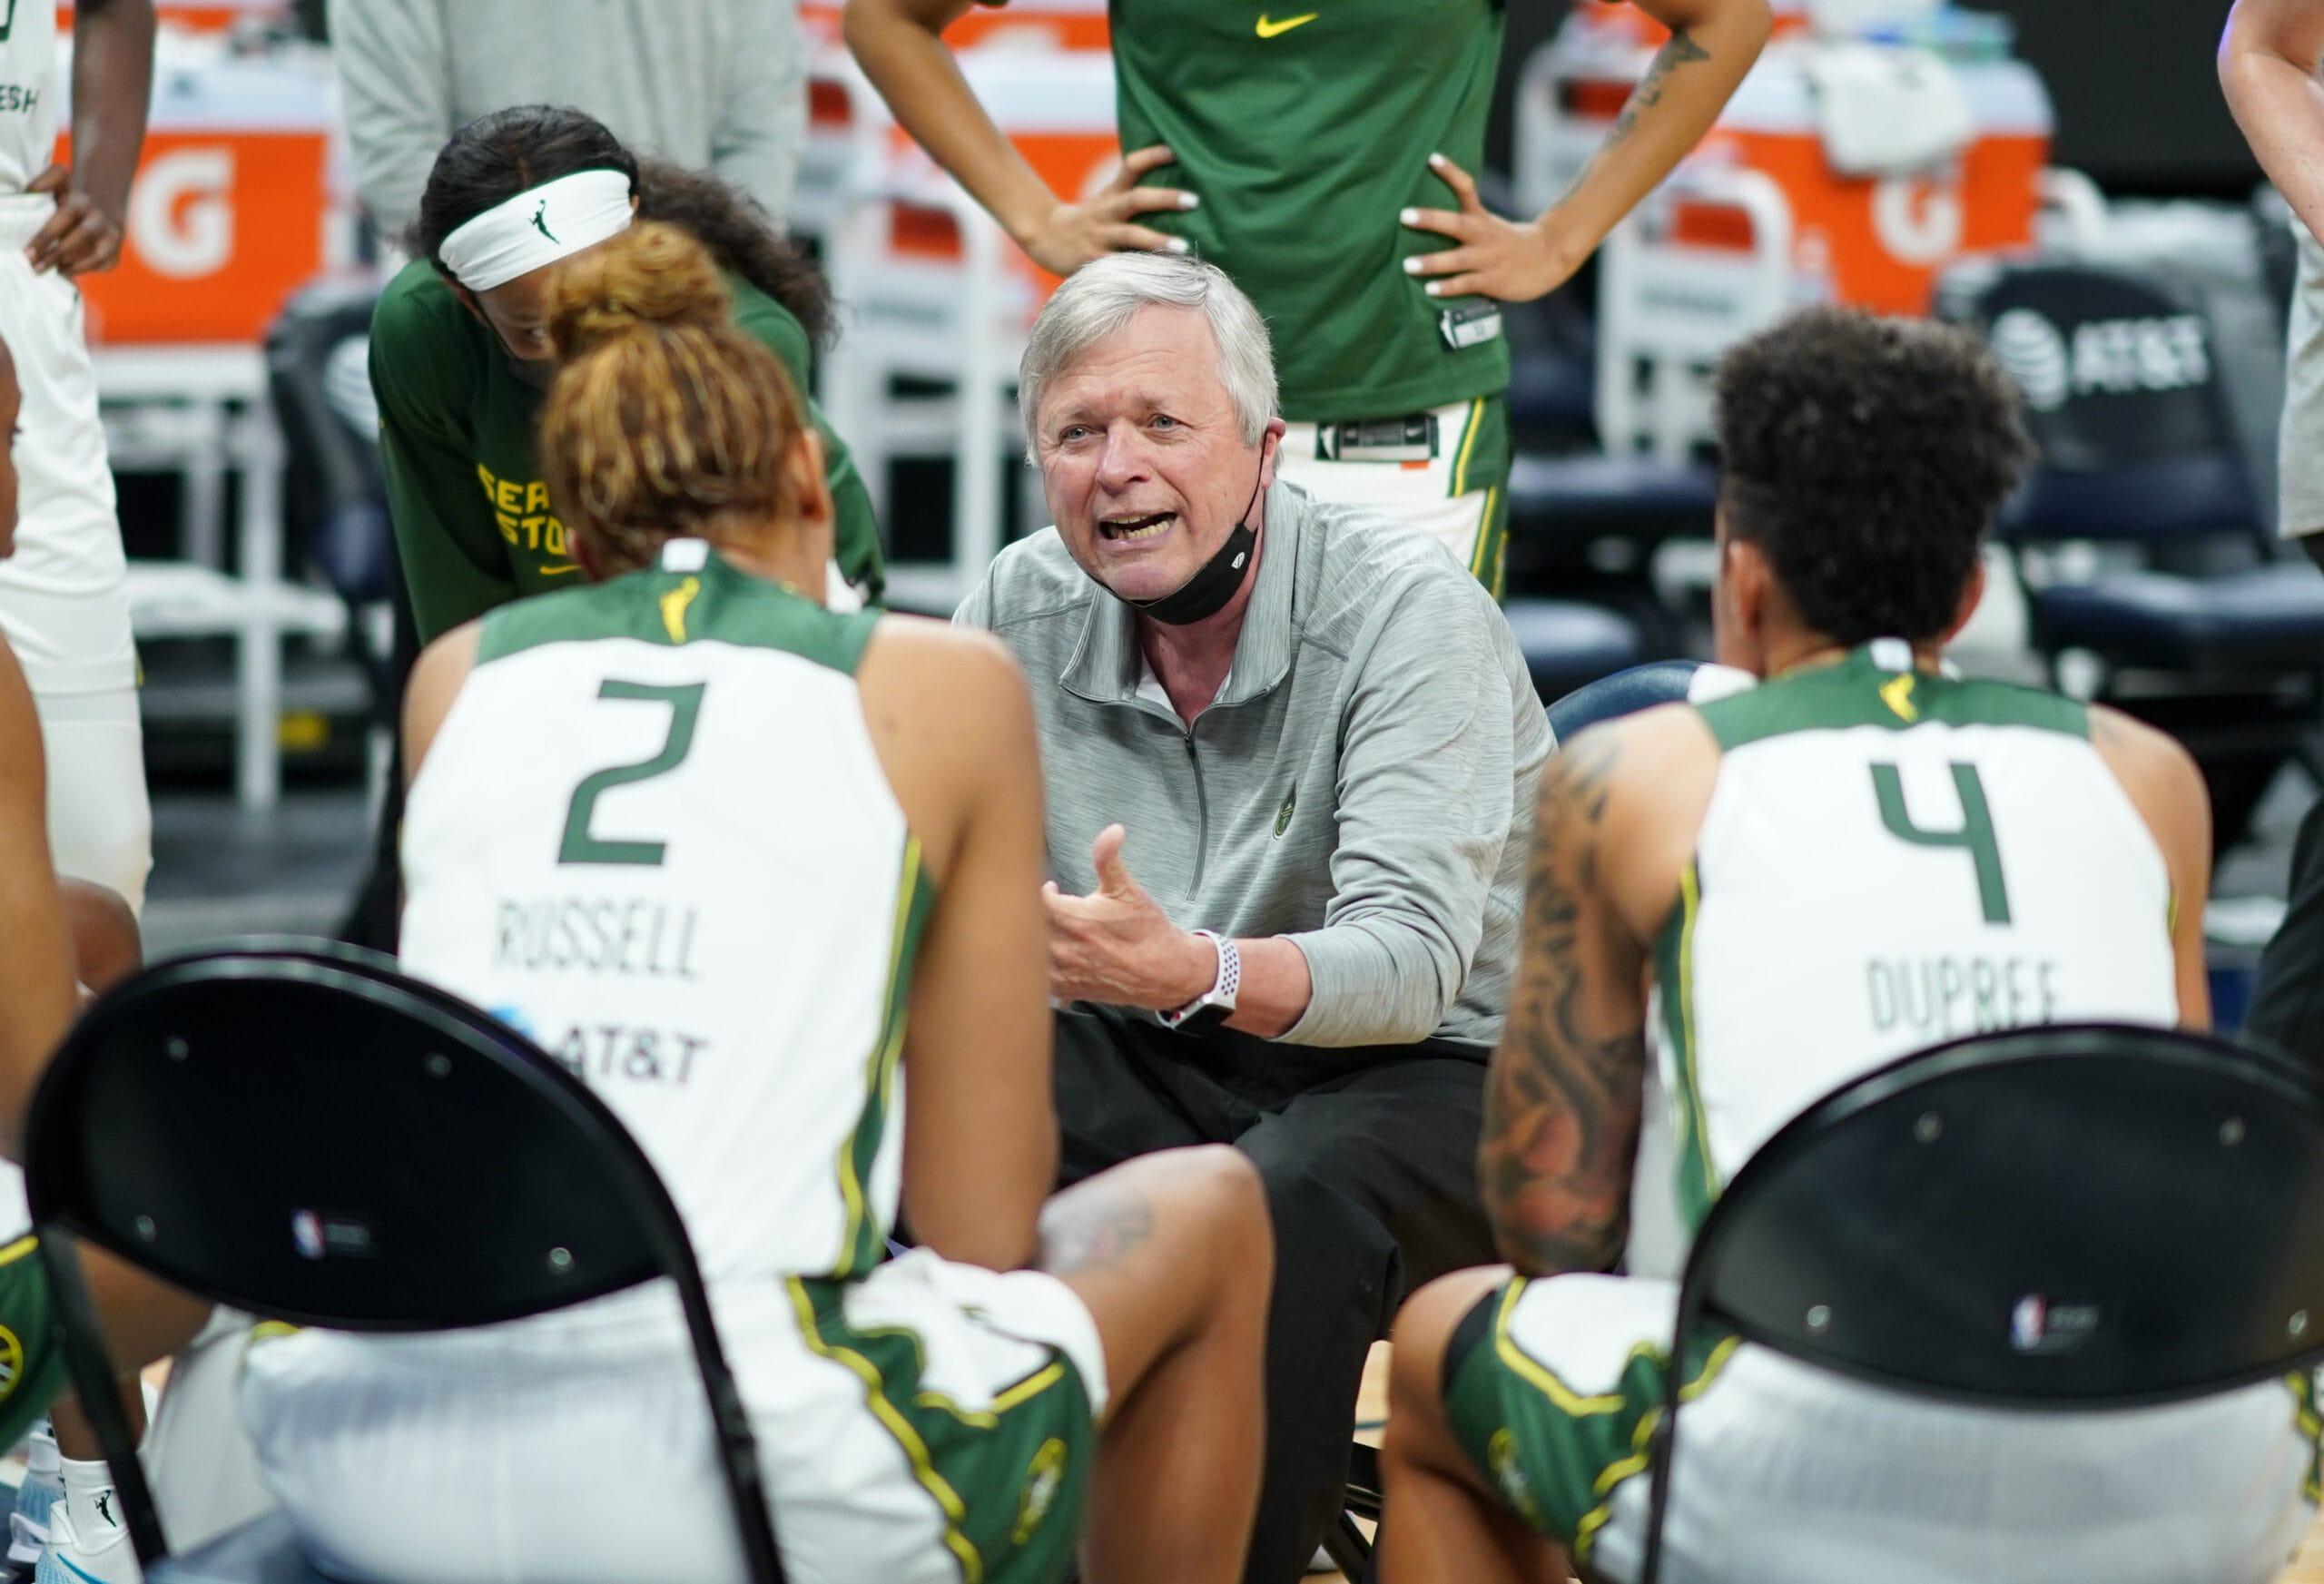 Storm, WNBA coaching icon Dan Hughes retires